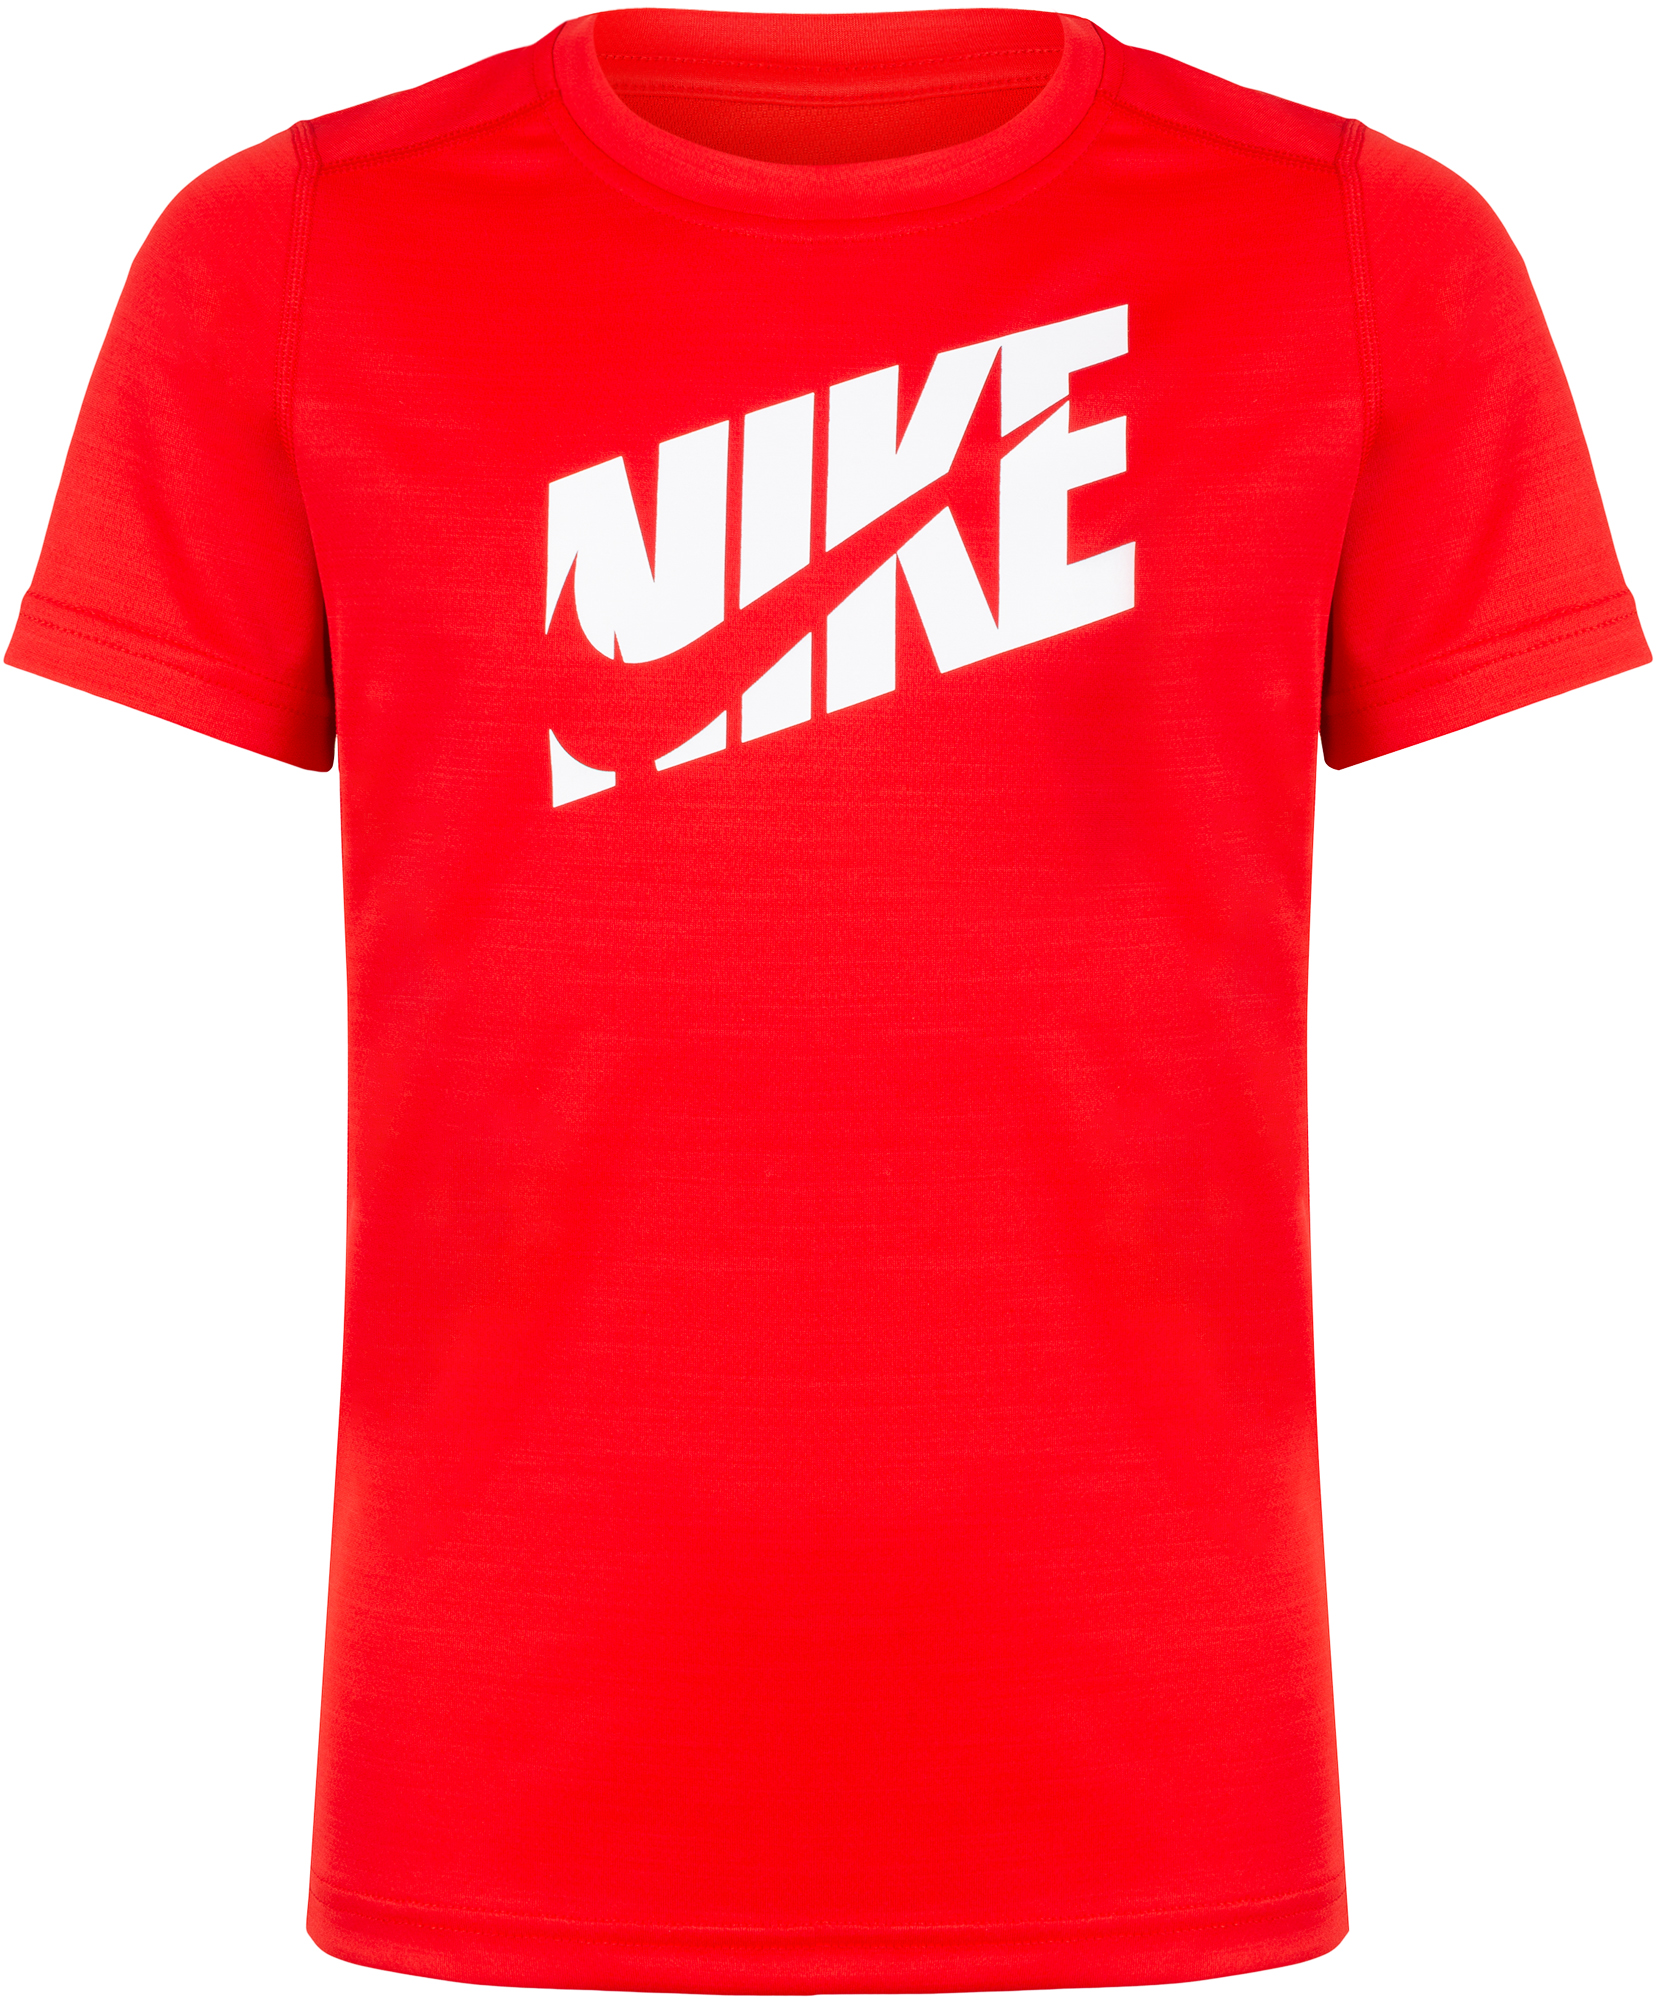 Nike Футболка для мальчиков Nike, размер 137-147 nike футболка для мальчиков nike geo basketball